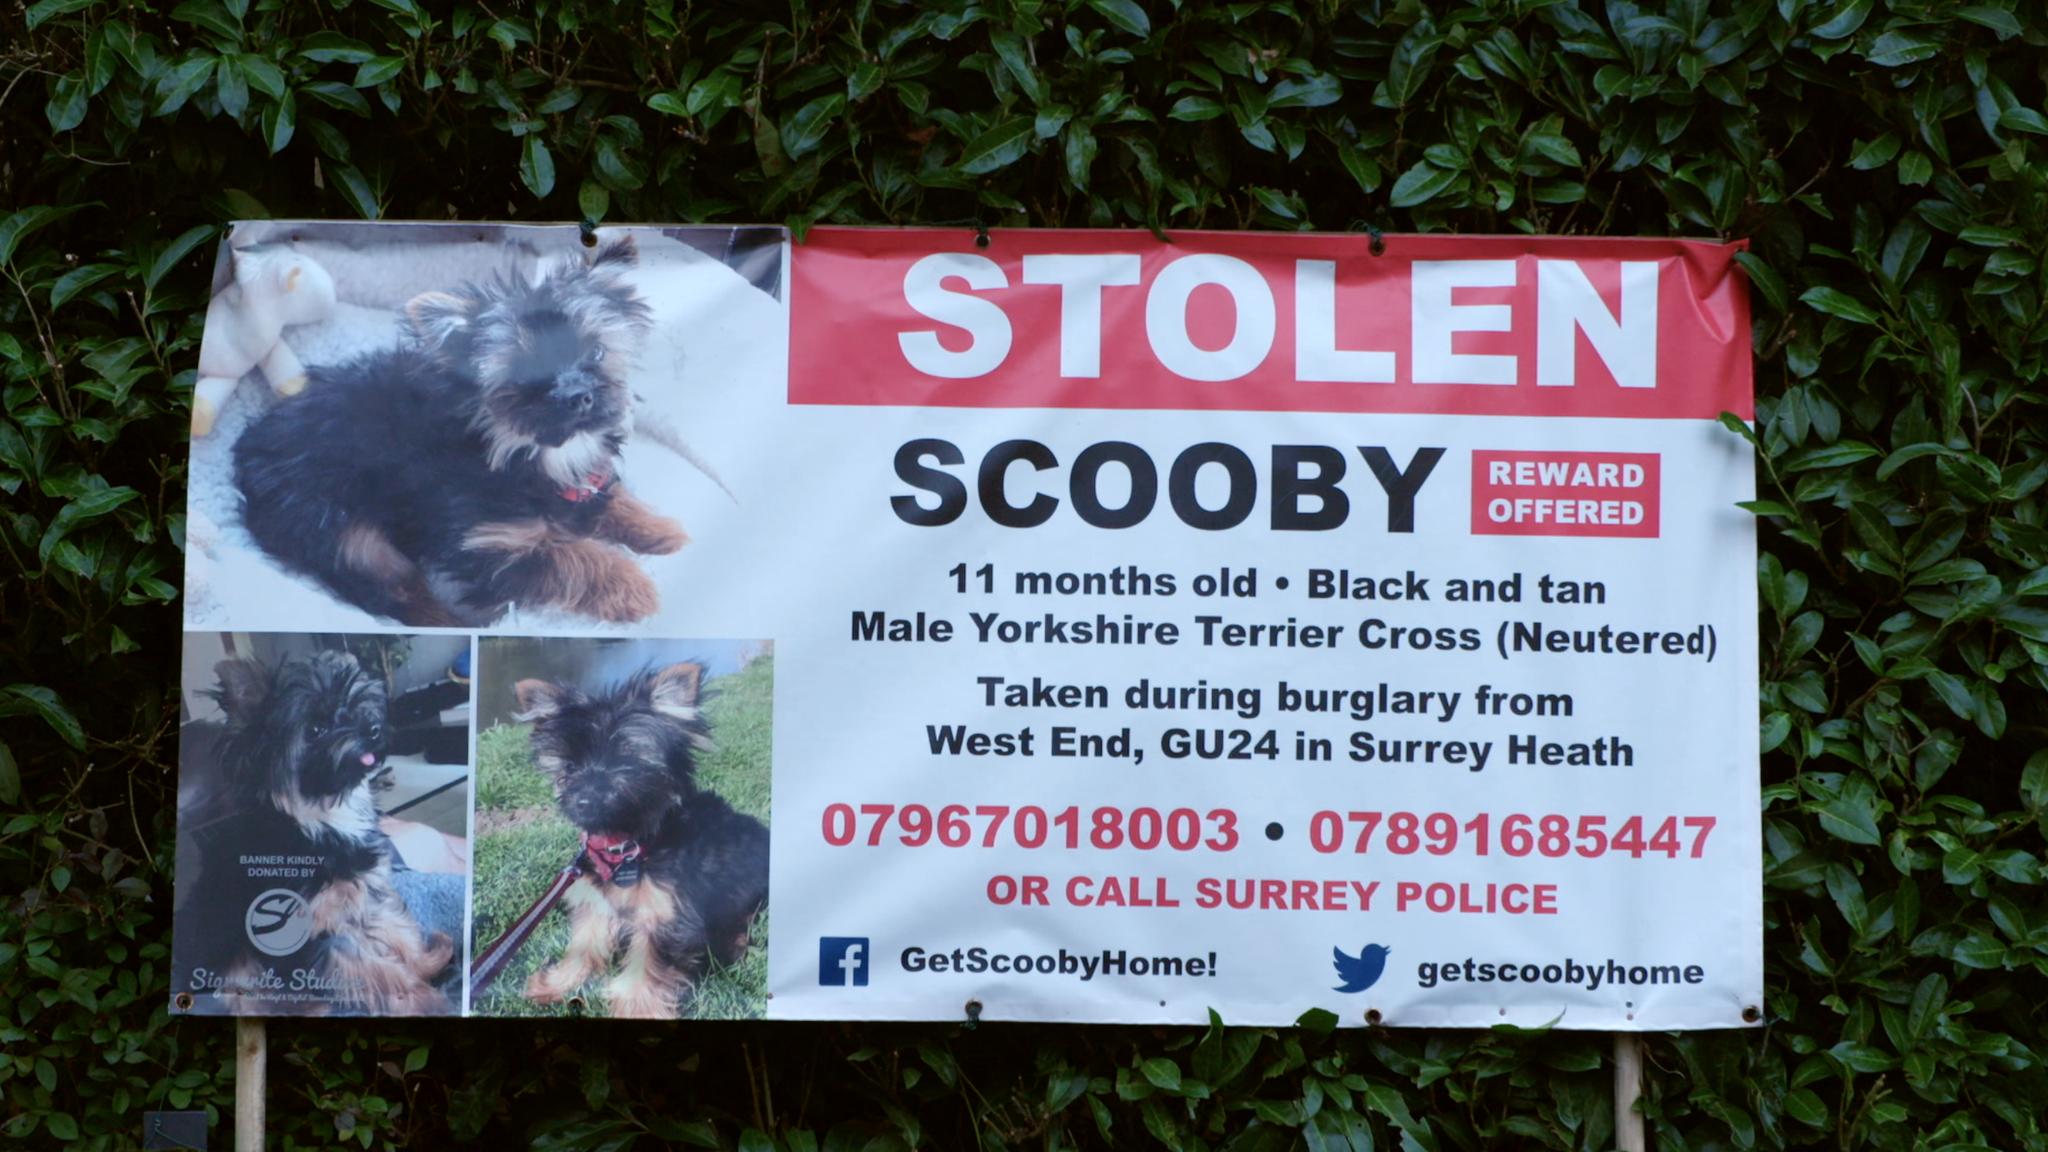 Stolen sign appealing for information